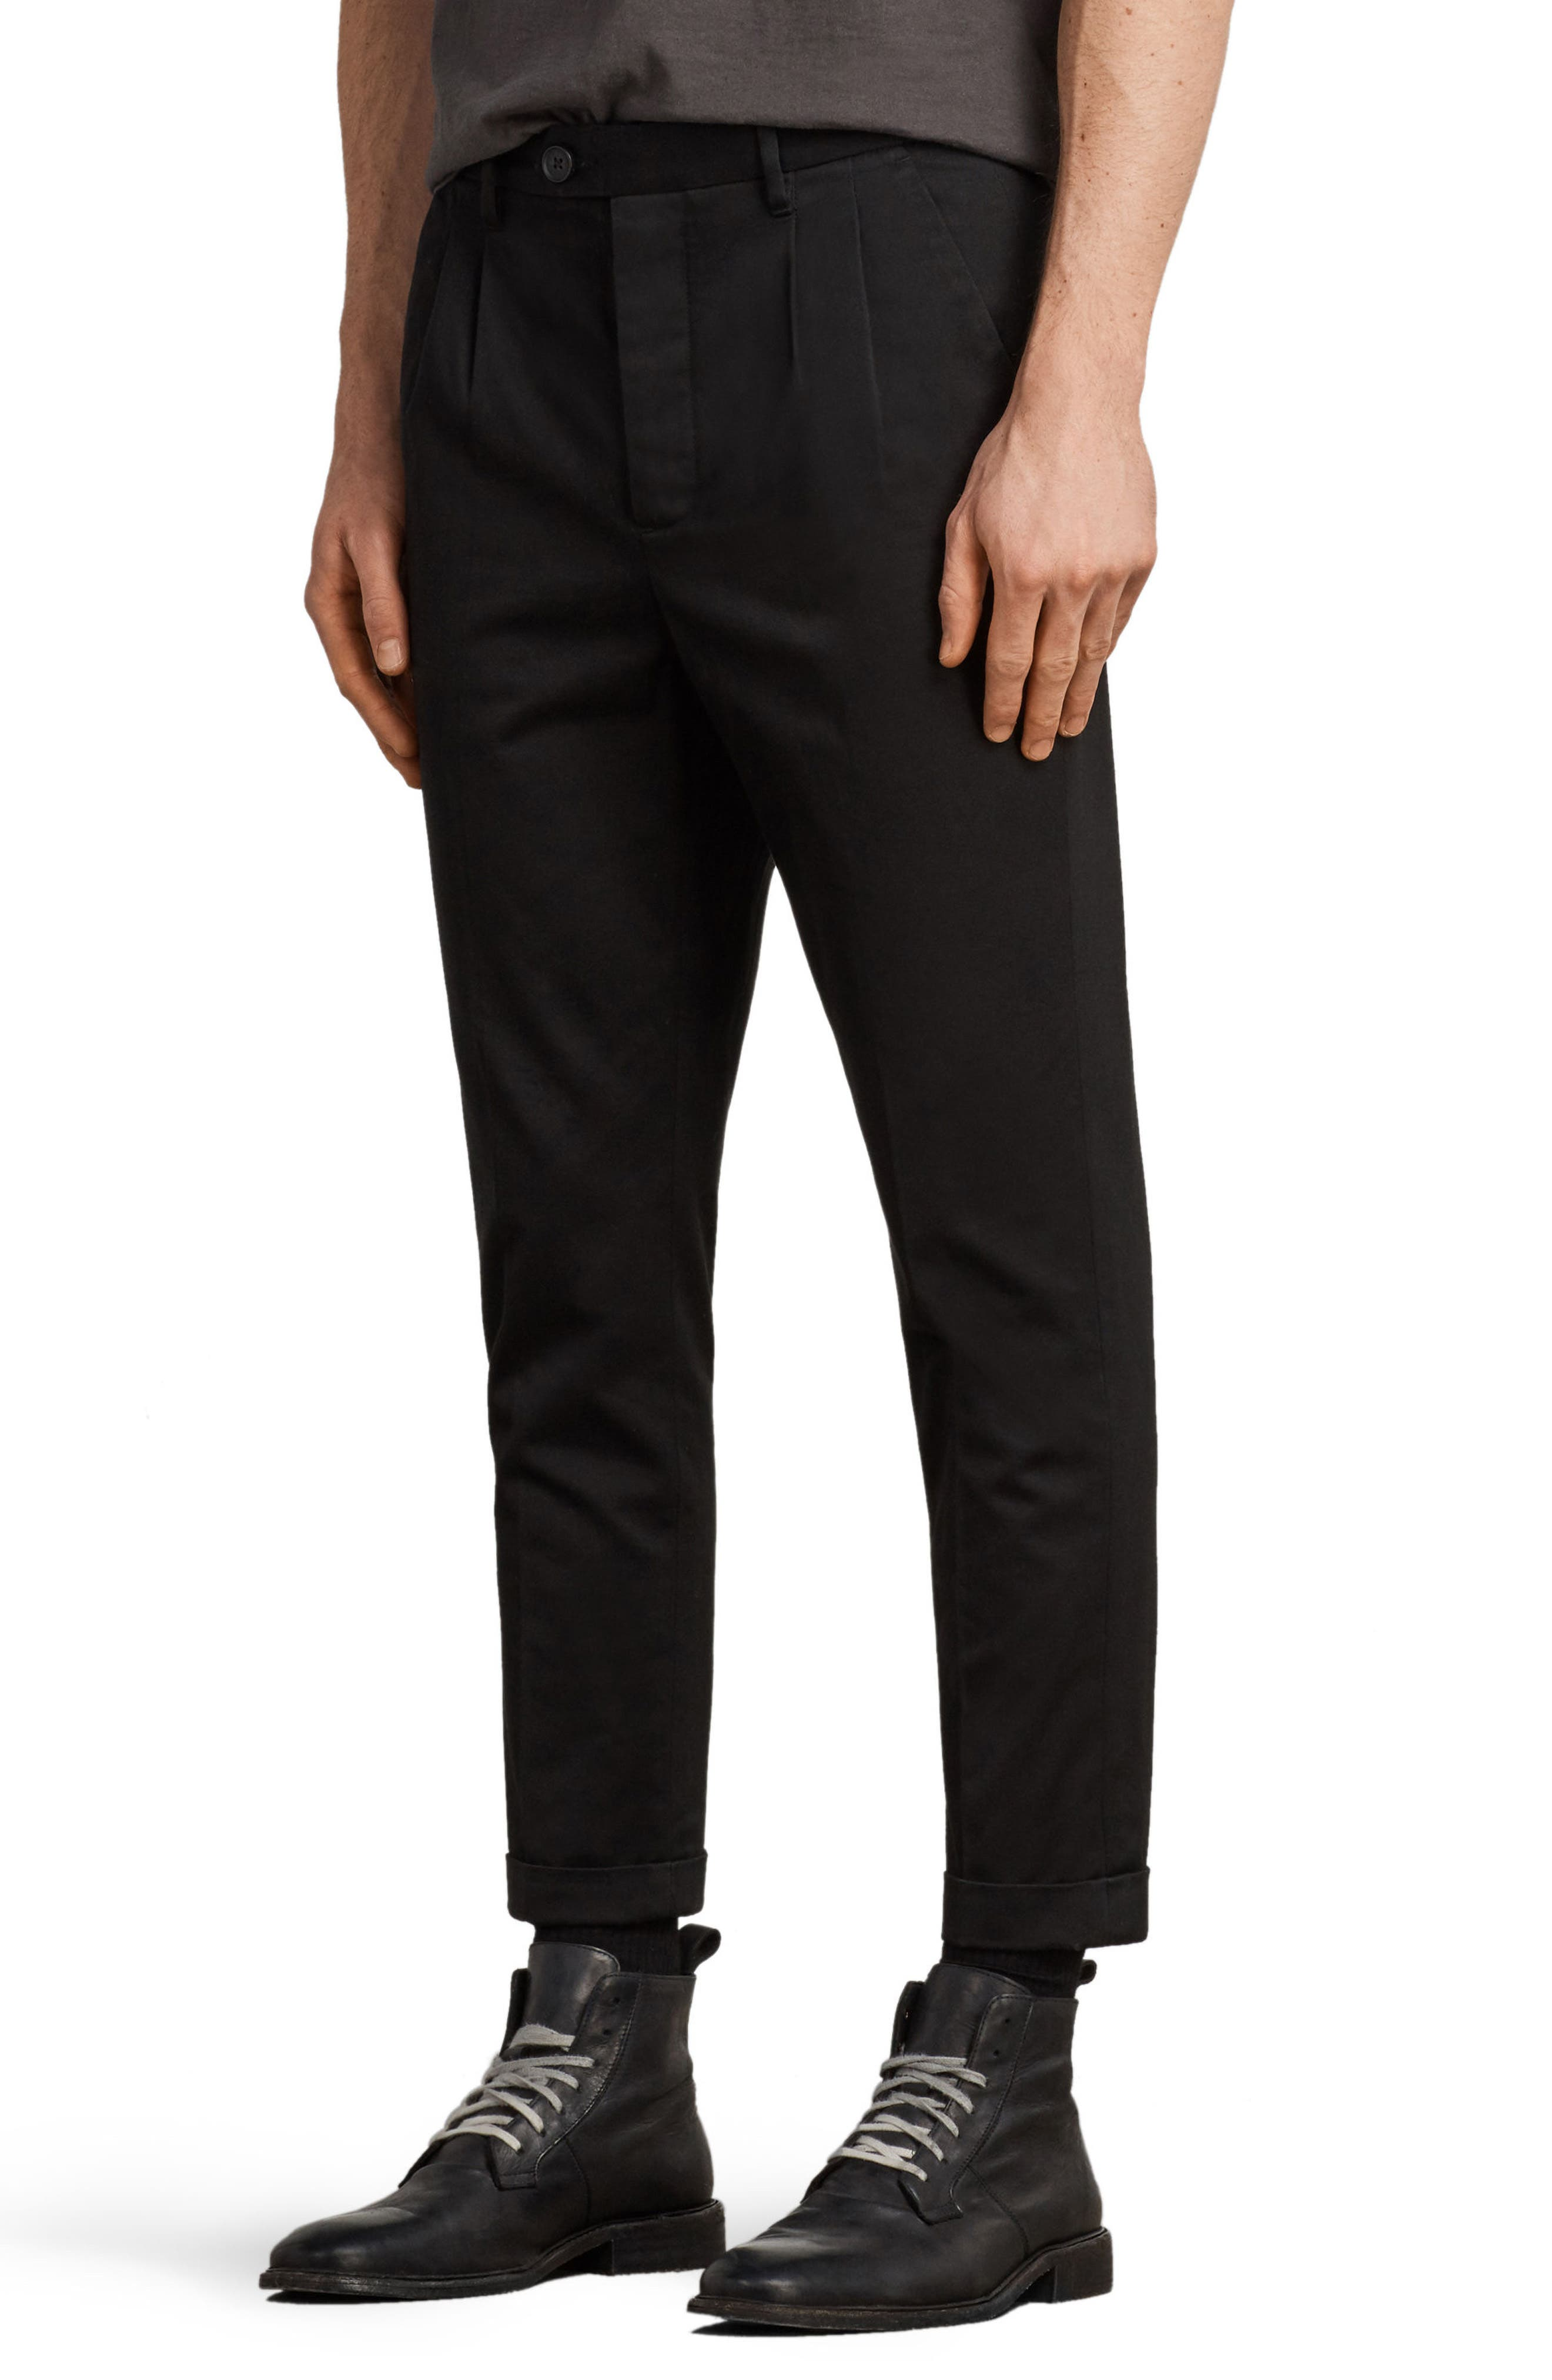 Salco Slim Fit Chino Pants,                             Alternate thumbnail 3, color,                             Black